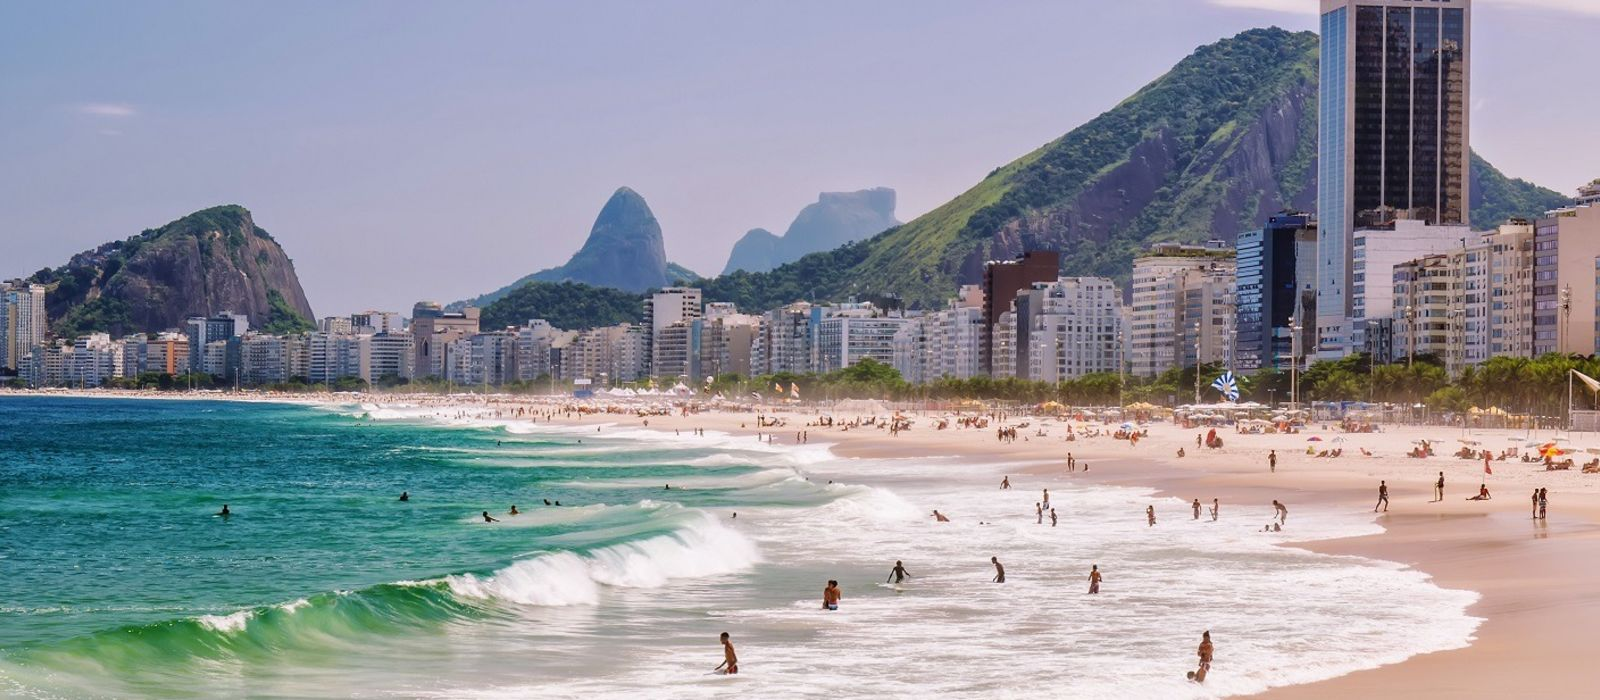 Brazil's Wildlife & Natural Wonders Tour Trip 7